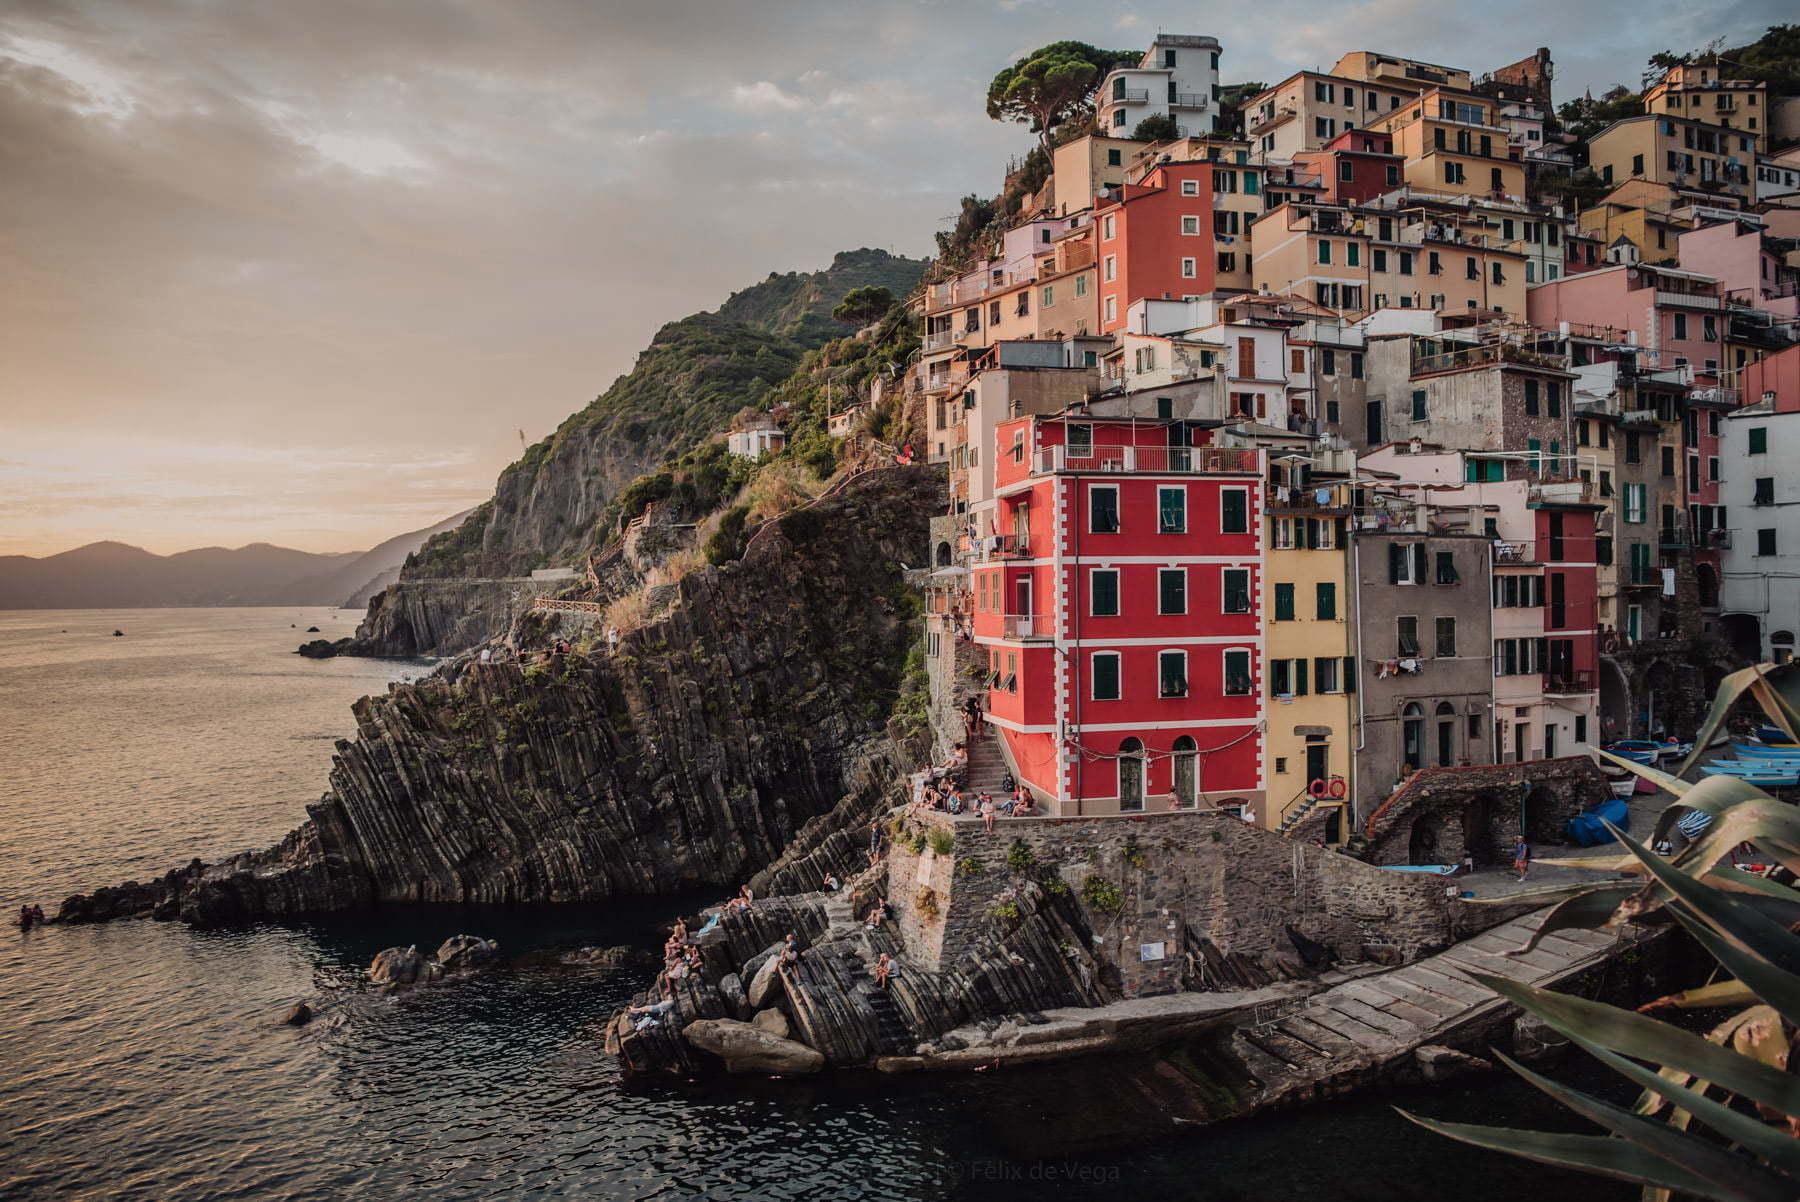 wedding photo session on the Cinque Terre coast